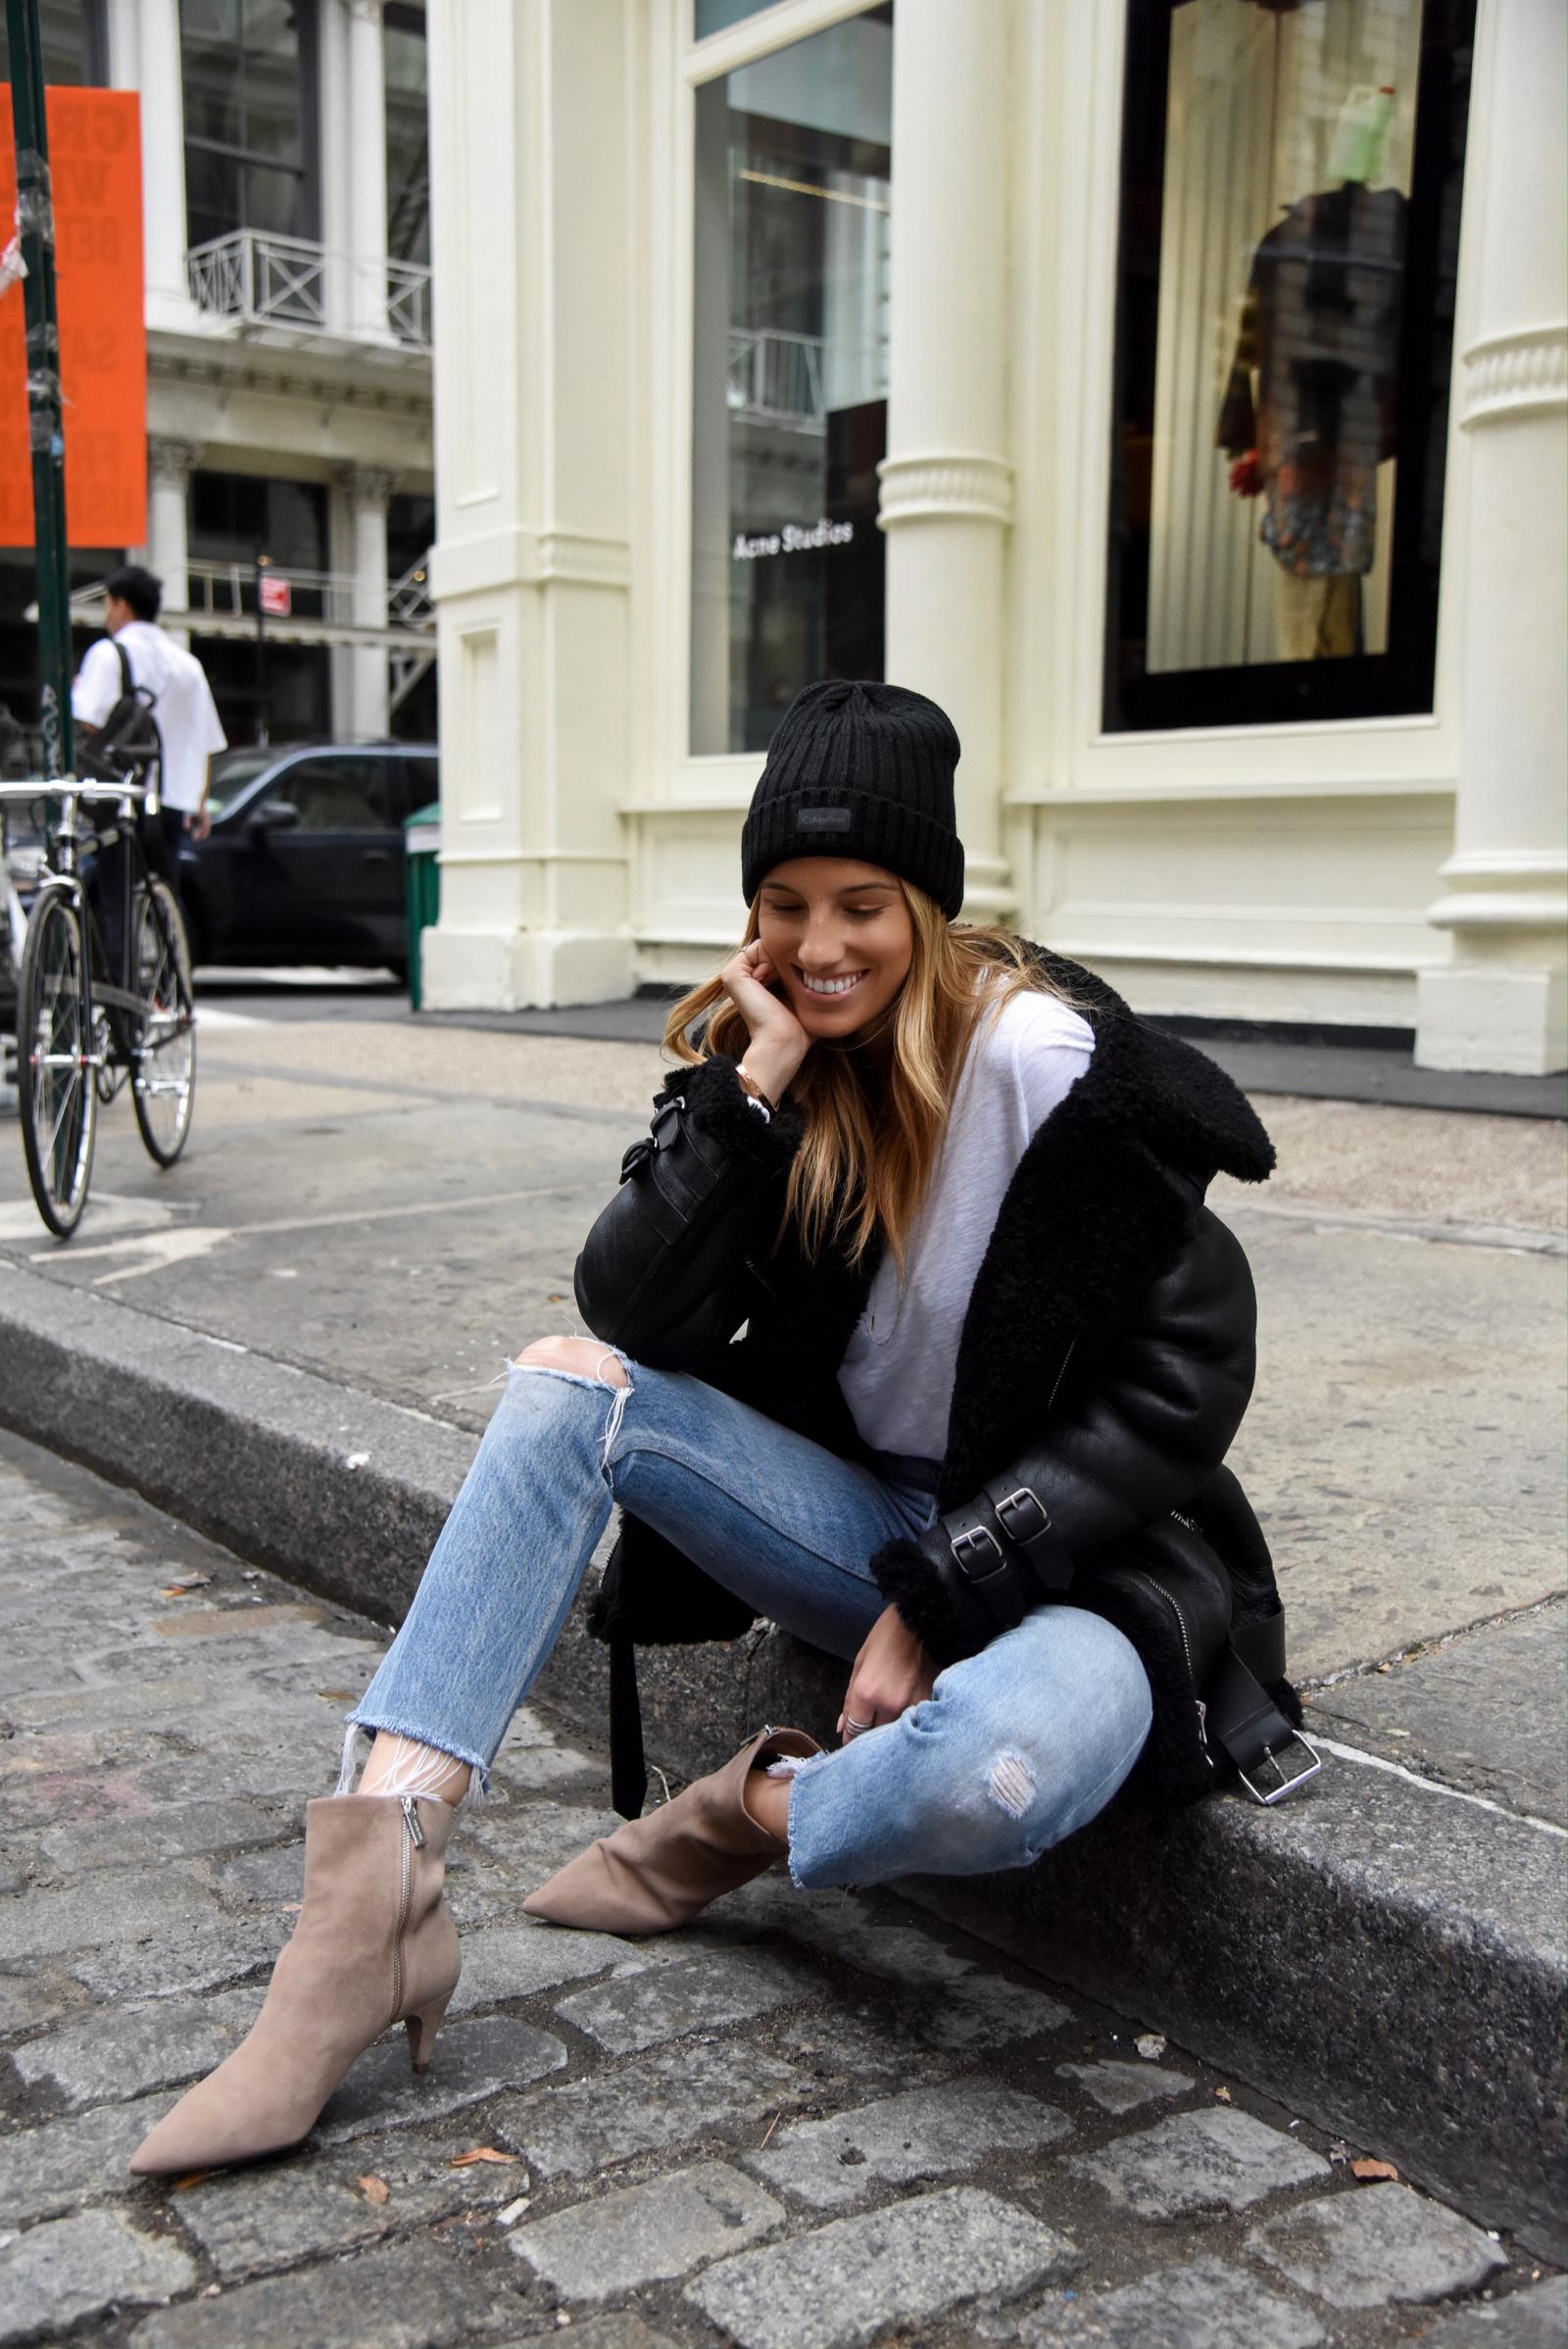 Macys, Michael Kors, Calvin Klein, Acne Studios, Levis